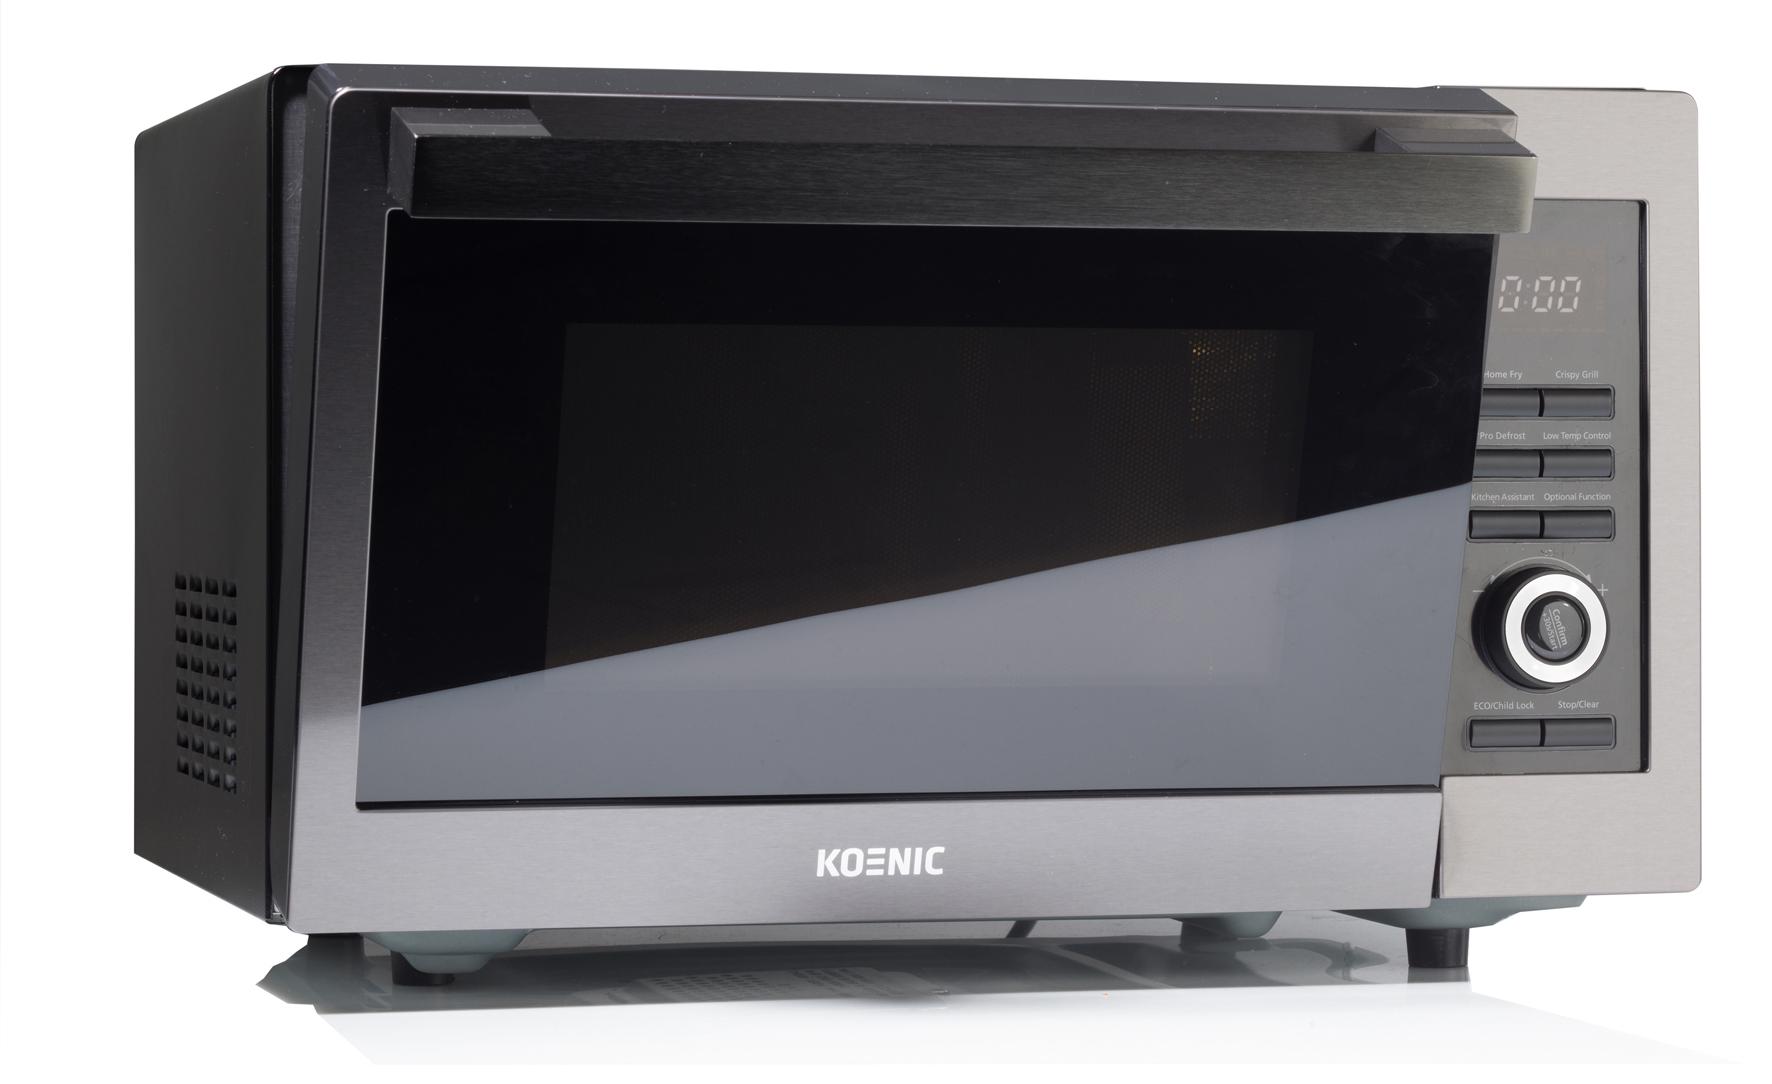 <h1>Koenic Mikrowelle KMWC 3019</h1><h3 style='font-size: 20px; margin: 0px 0px 15px 0px;'> -Kombi-Mikrowelle, Automatikprogramme</h3>